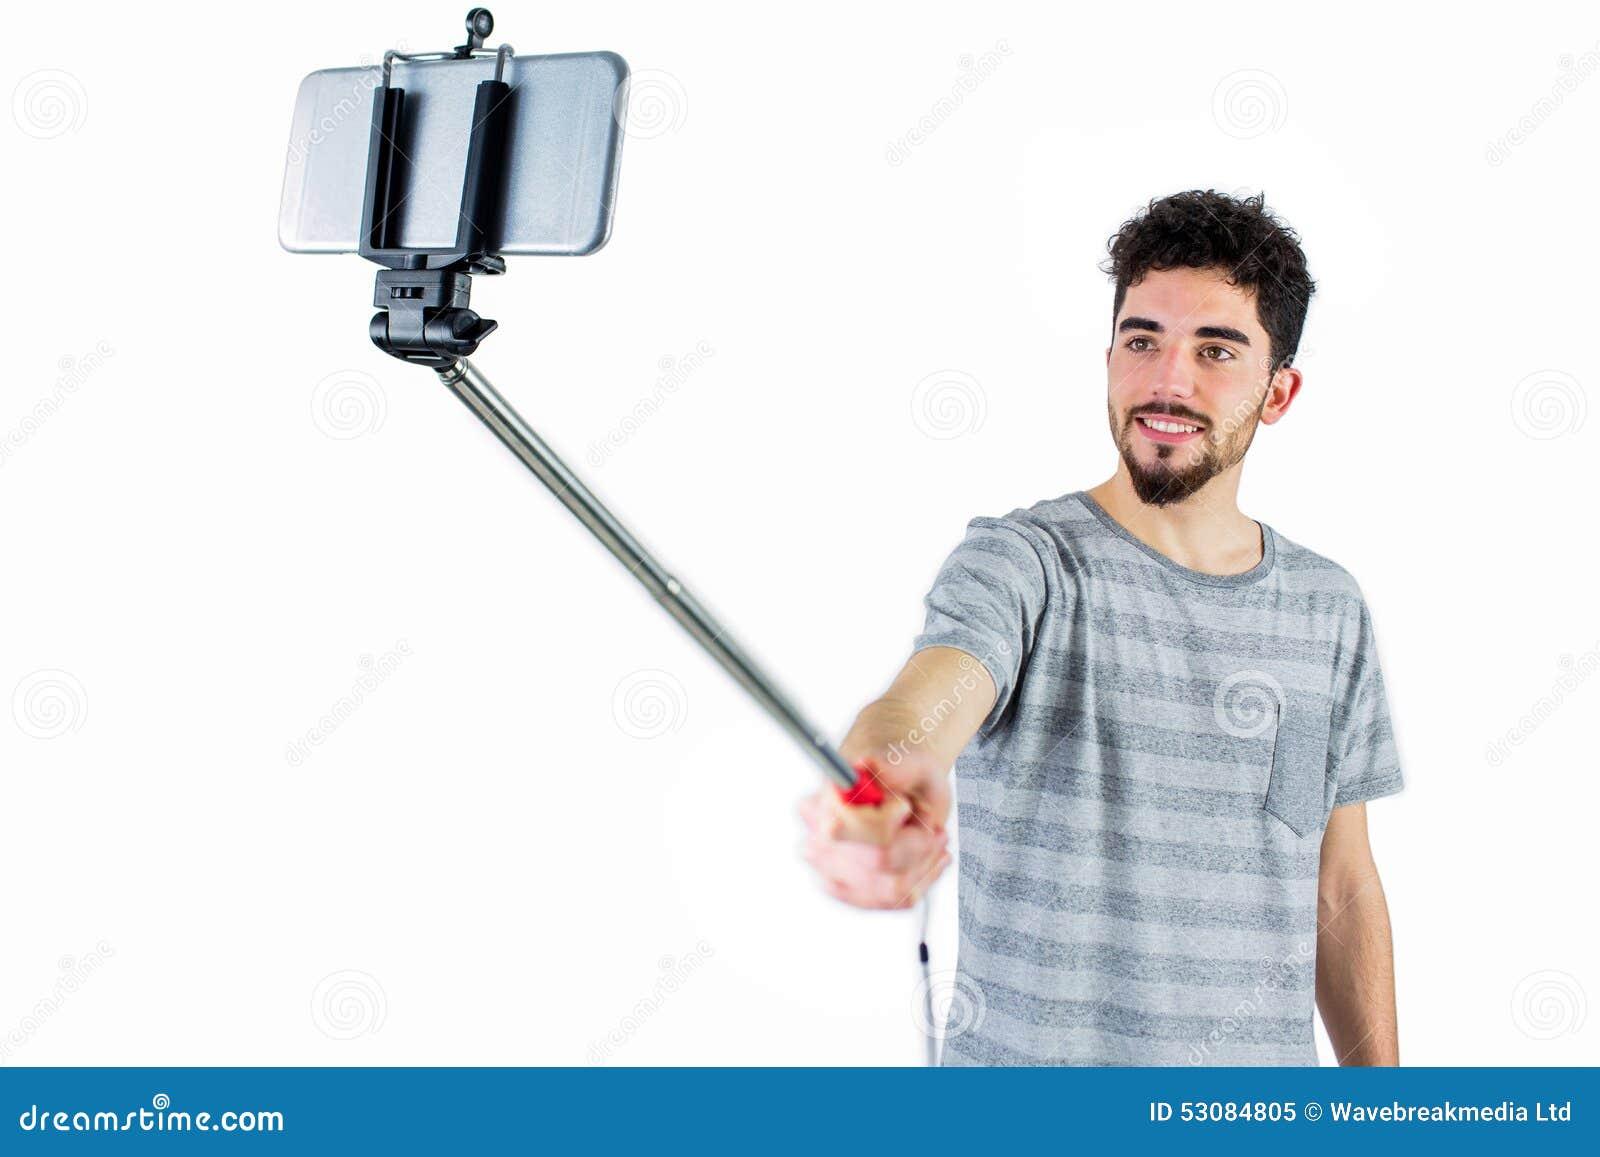 casual man using a selfie stick stock photo image 53084805. Black Bedroom Furniture Sets. Home Design Ideas